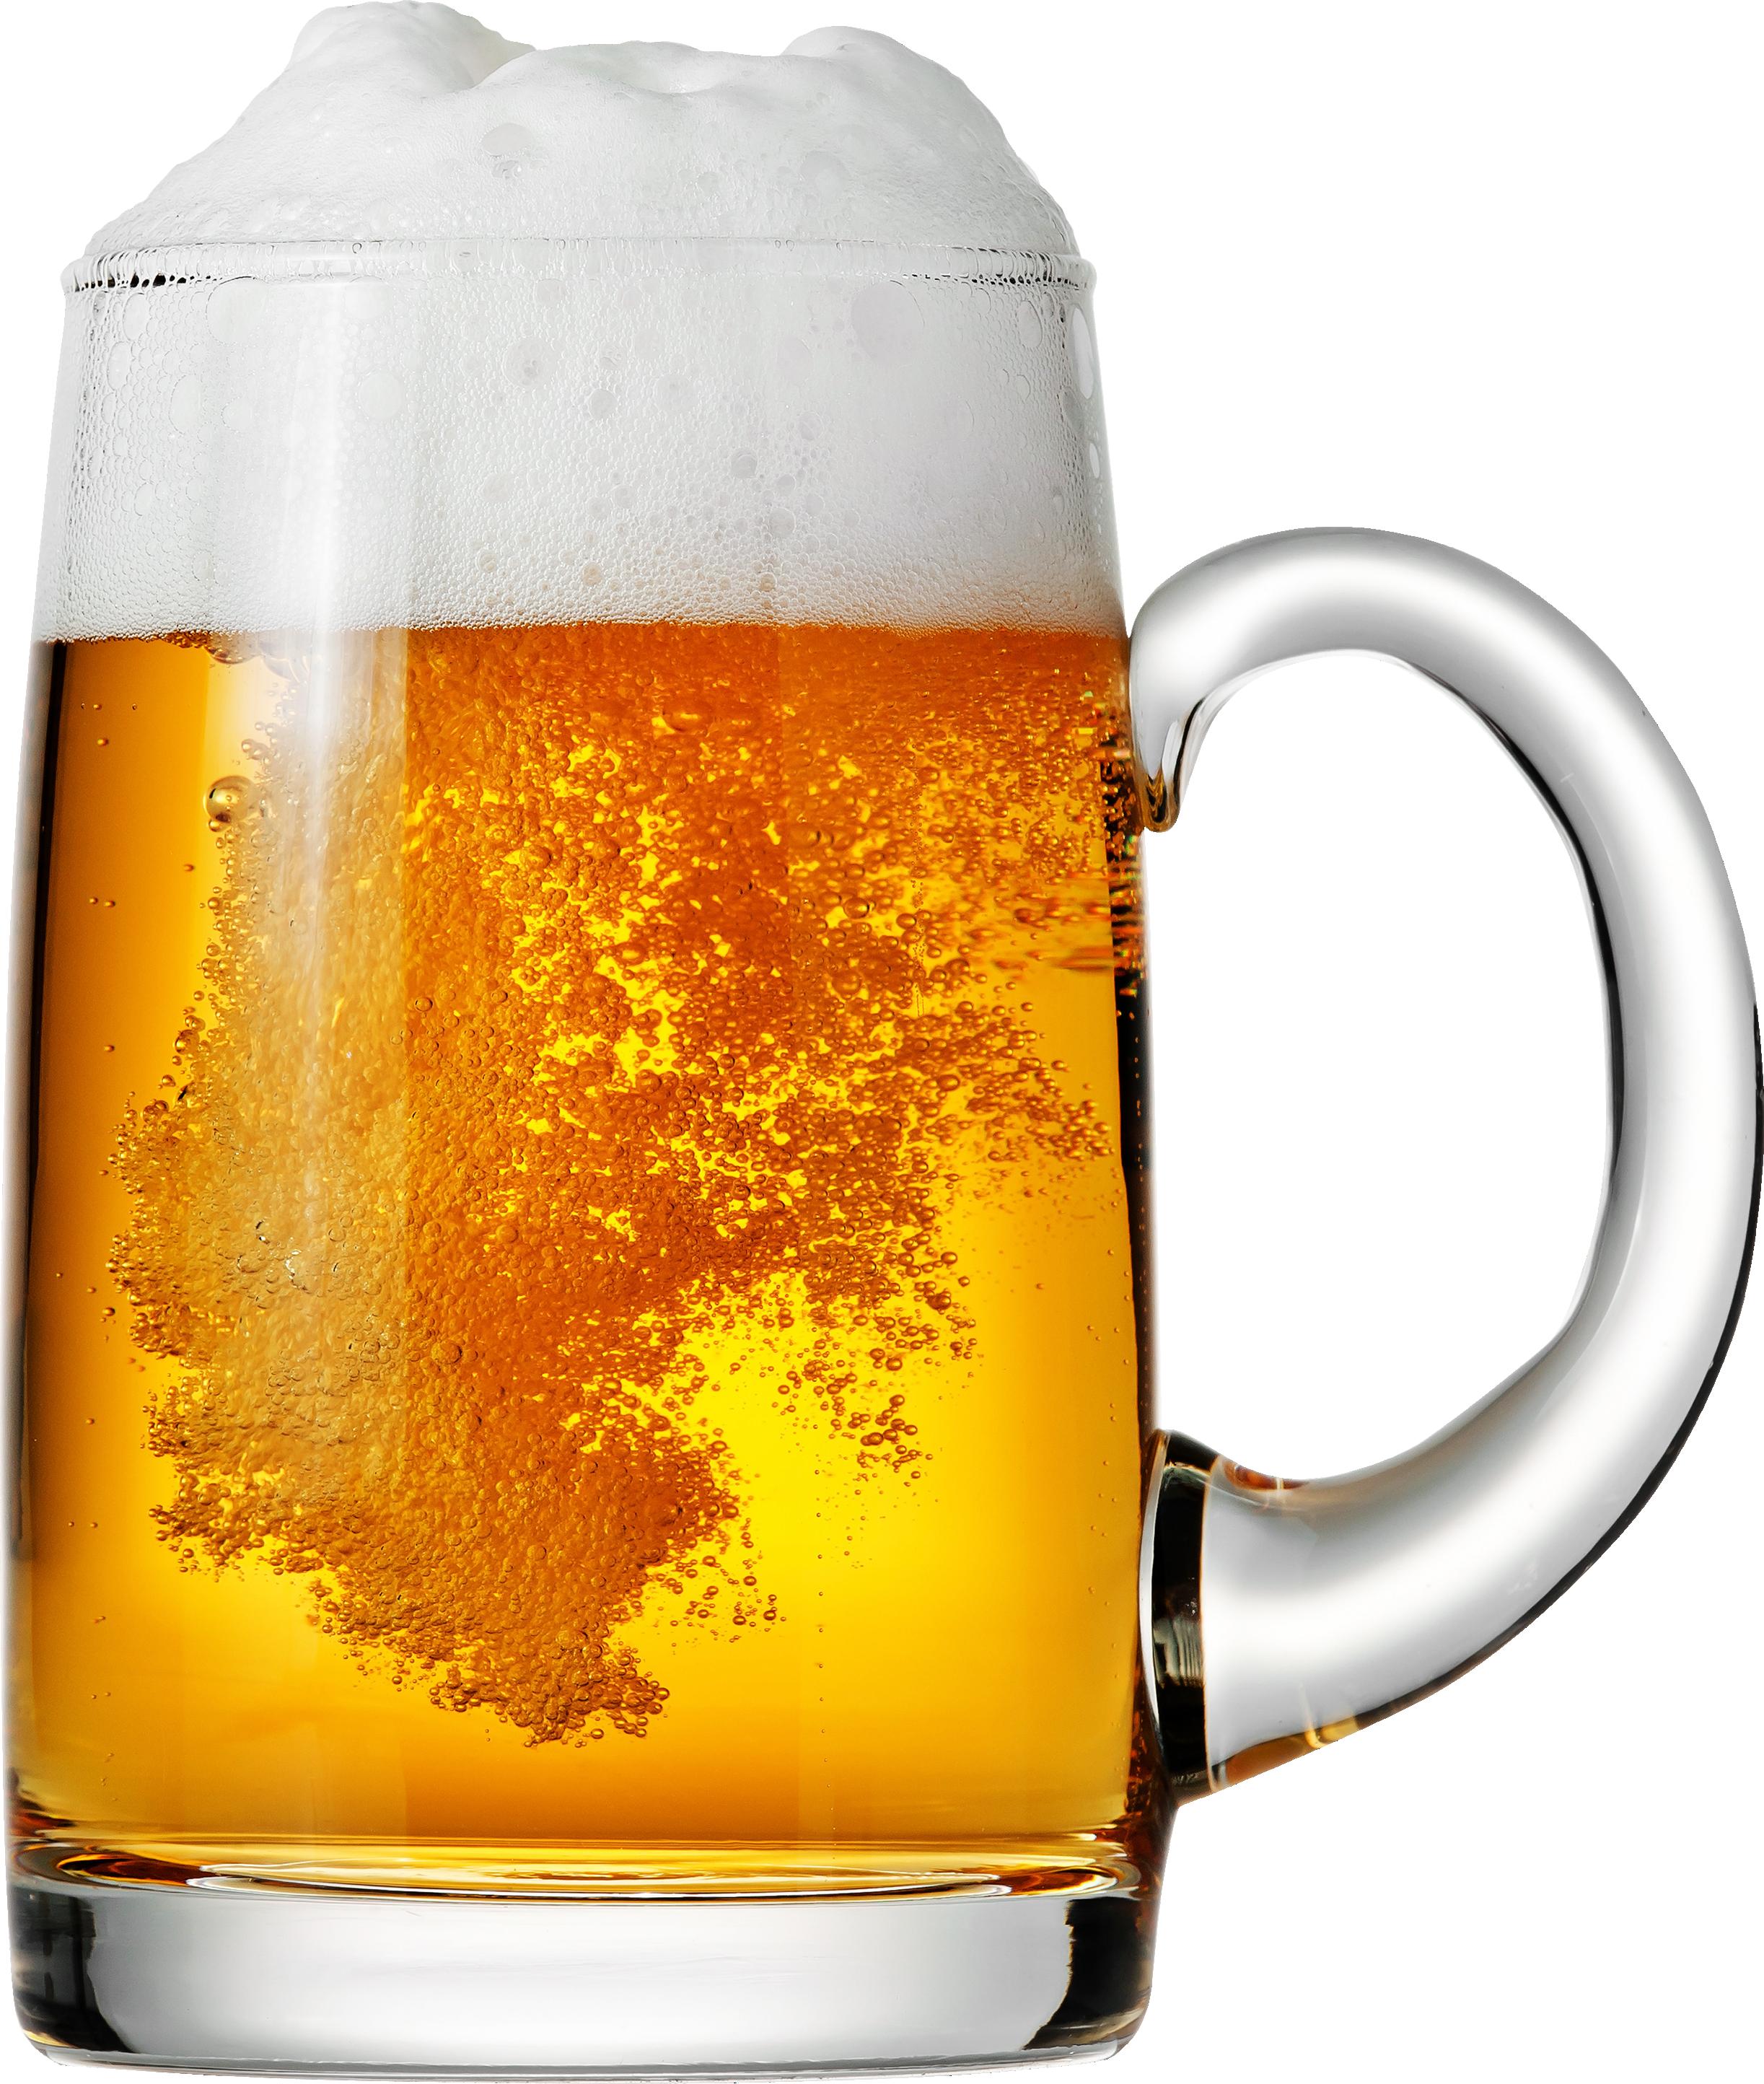 Summer Draught Beer Vector Png Beer Beer Mug Png Transparent Image And Clipart For Free Download Beer Cartoon Beer Tattoos Beer Vector